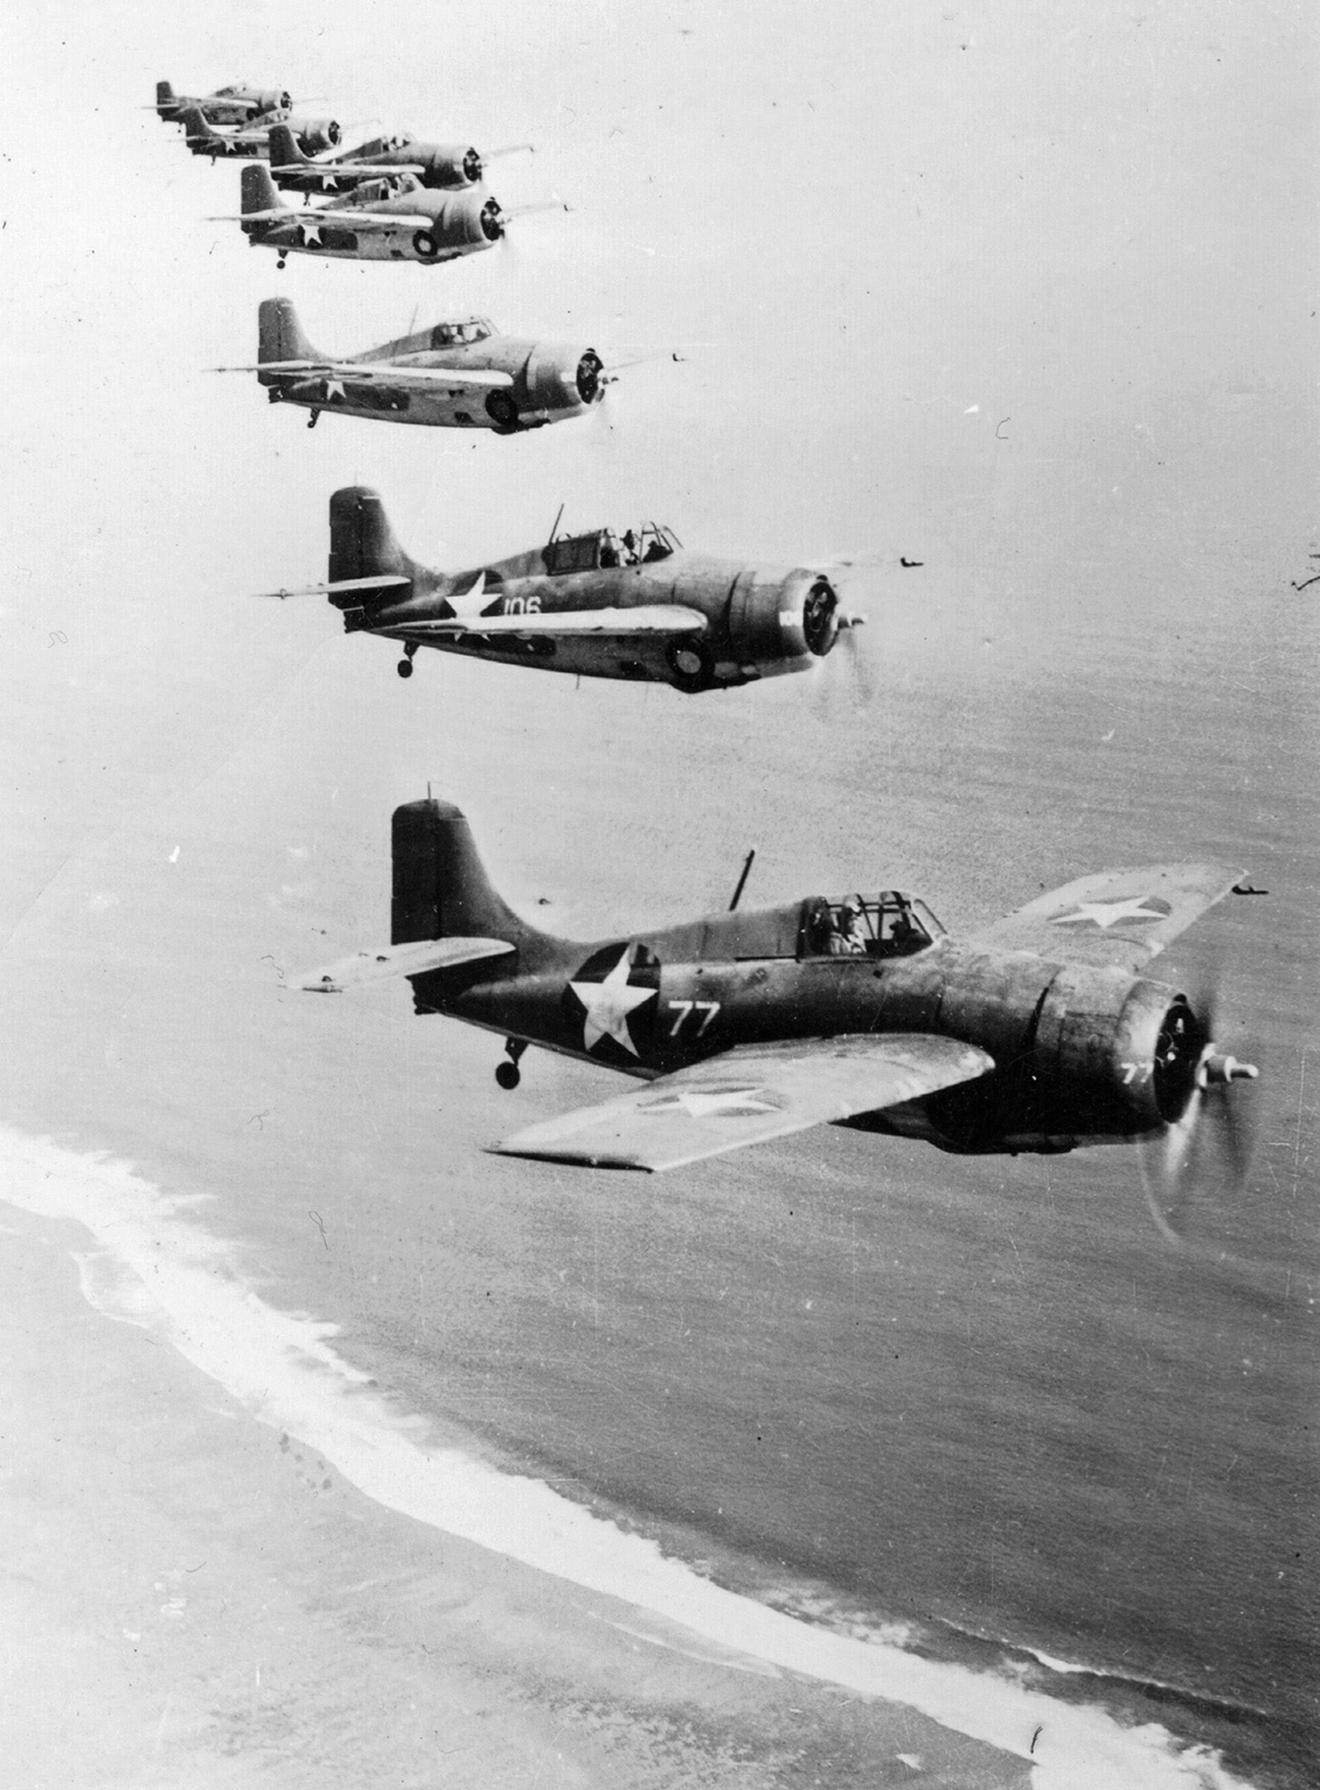 Grumman F4F 4 Wildcat VMF 221 White 77 Lt James Elms Swett who sd 7 Val's over Tulagi 7th Apr 1943 01